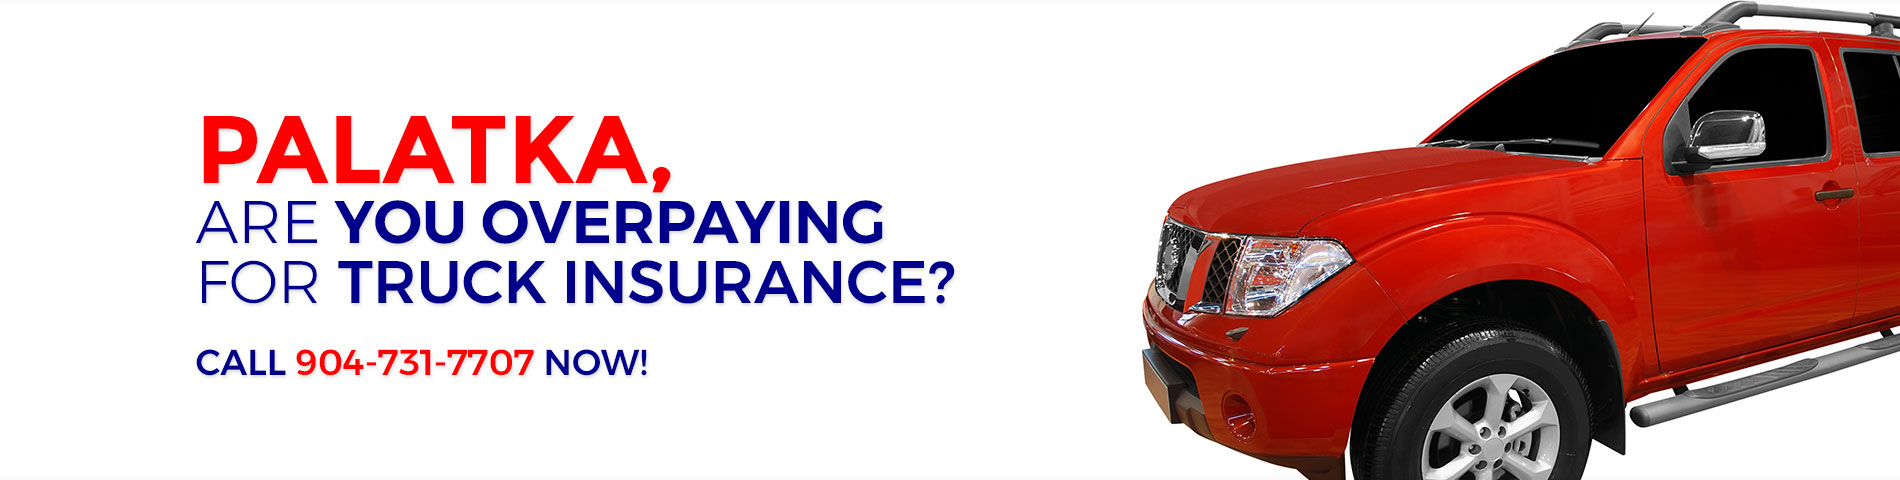 Affordable Car Insurance Palatka Fl Aai